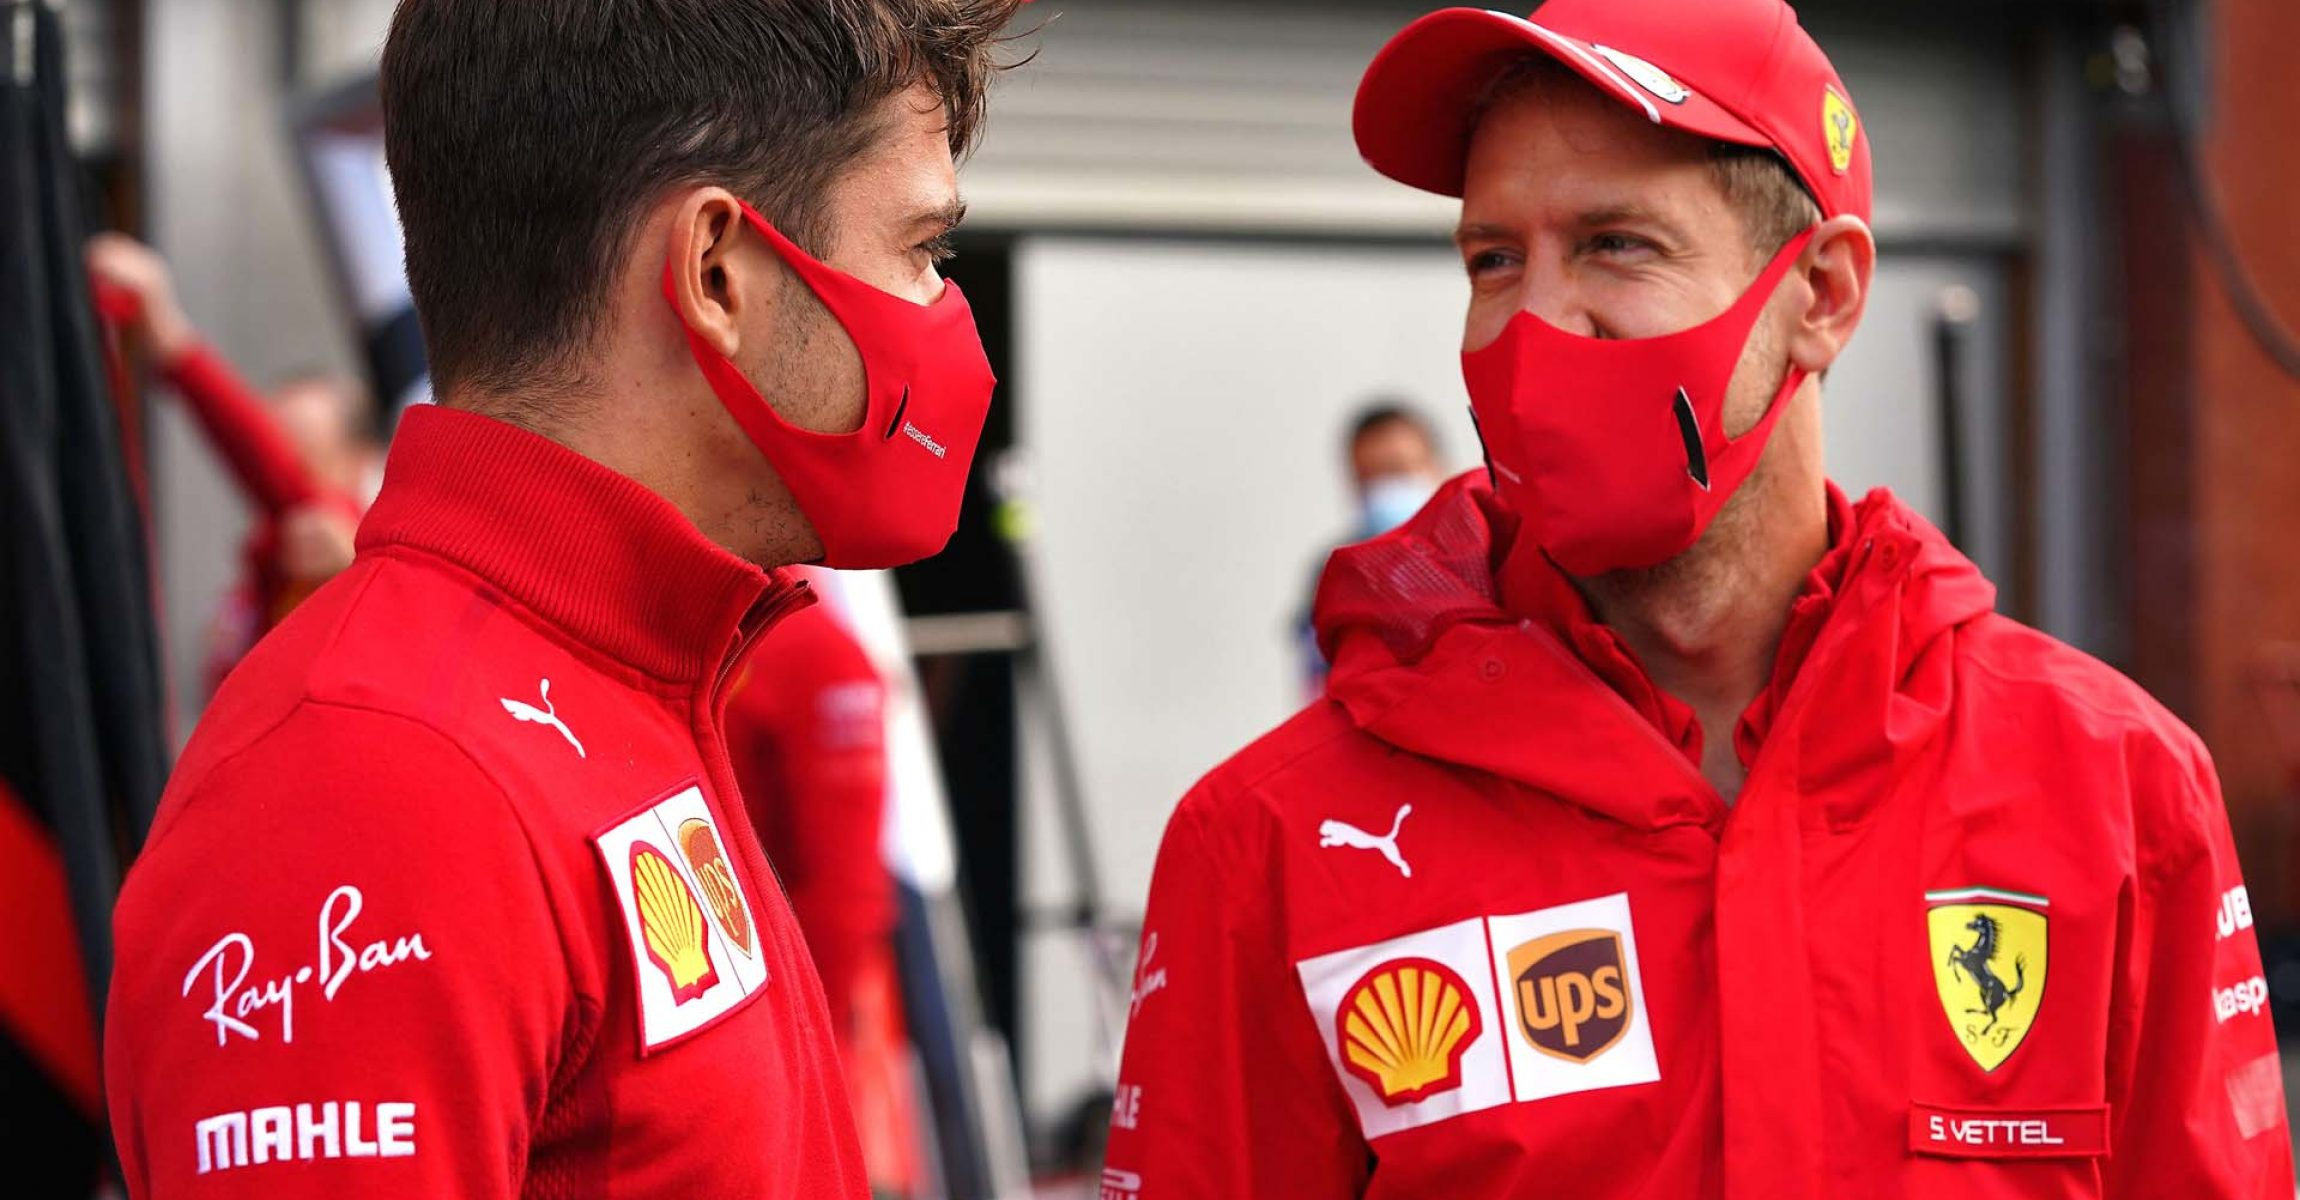 GP BELGIO F1/2020 -  DOMENICA 30/08/2020    credit: @Scuderia Ferrari Press Office Charles Leclerc Sebastian Vettel